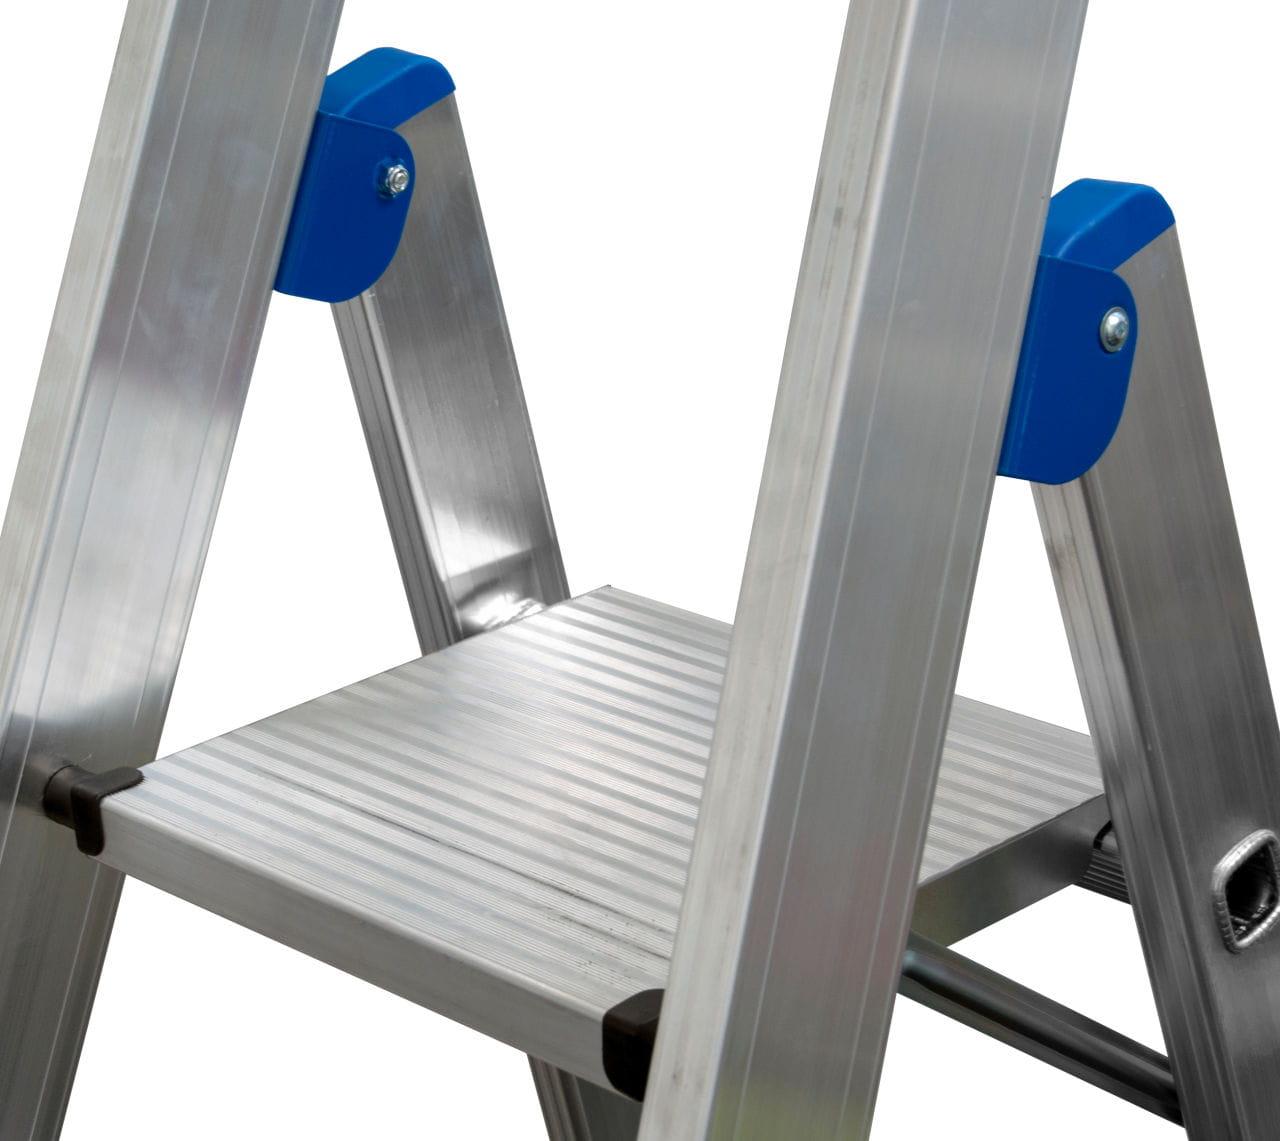 Platforma aluminiowa KRAUSE Stabilo 1x8 jezdniowa drabina